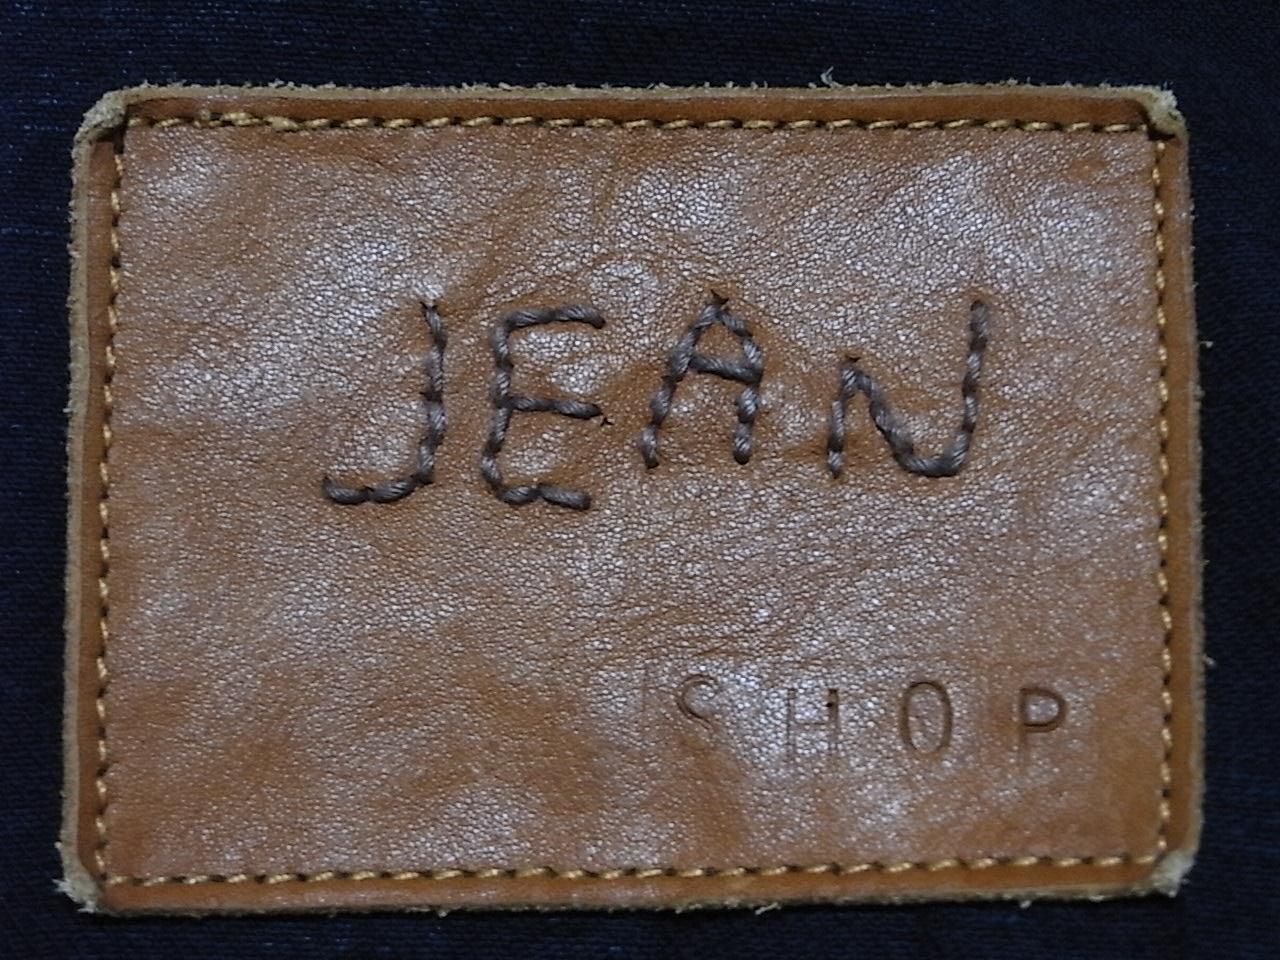 jeanshop blk jkt